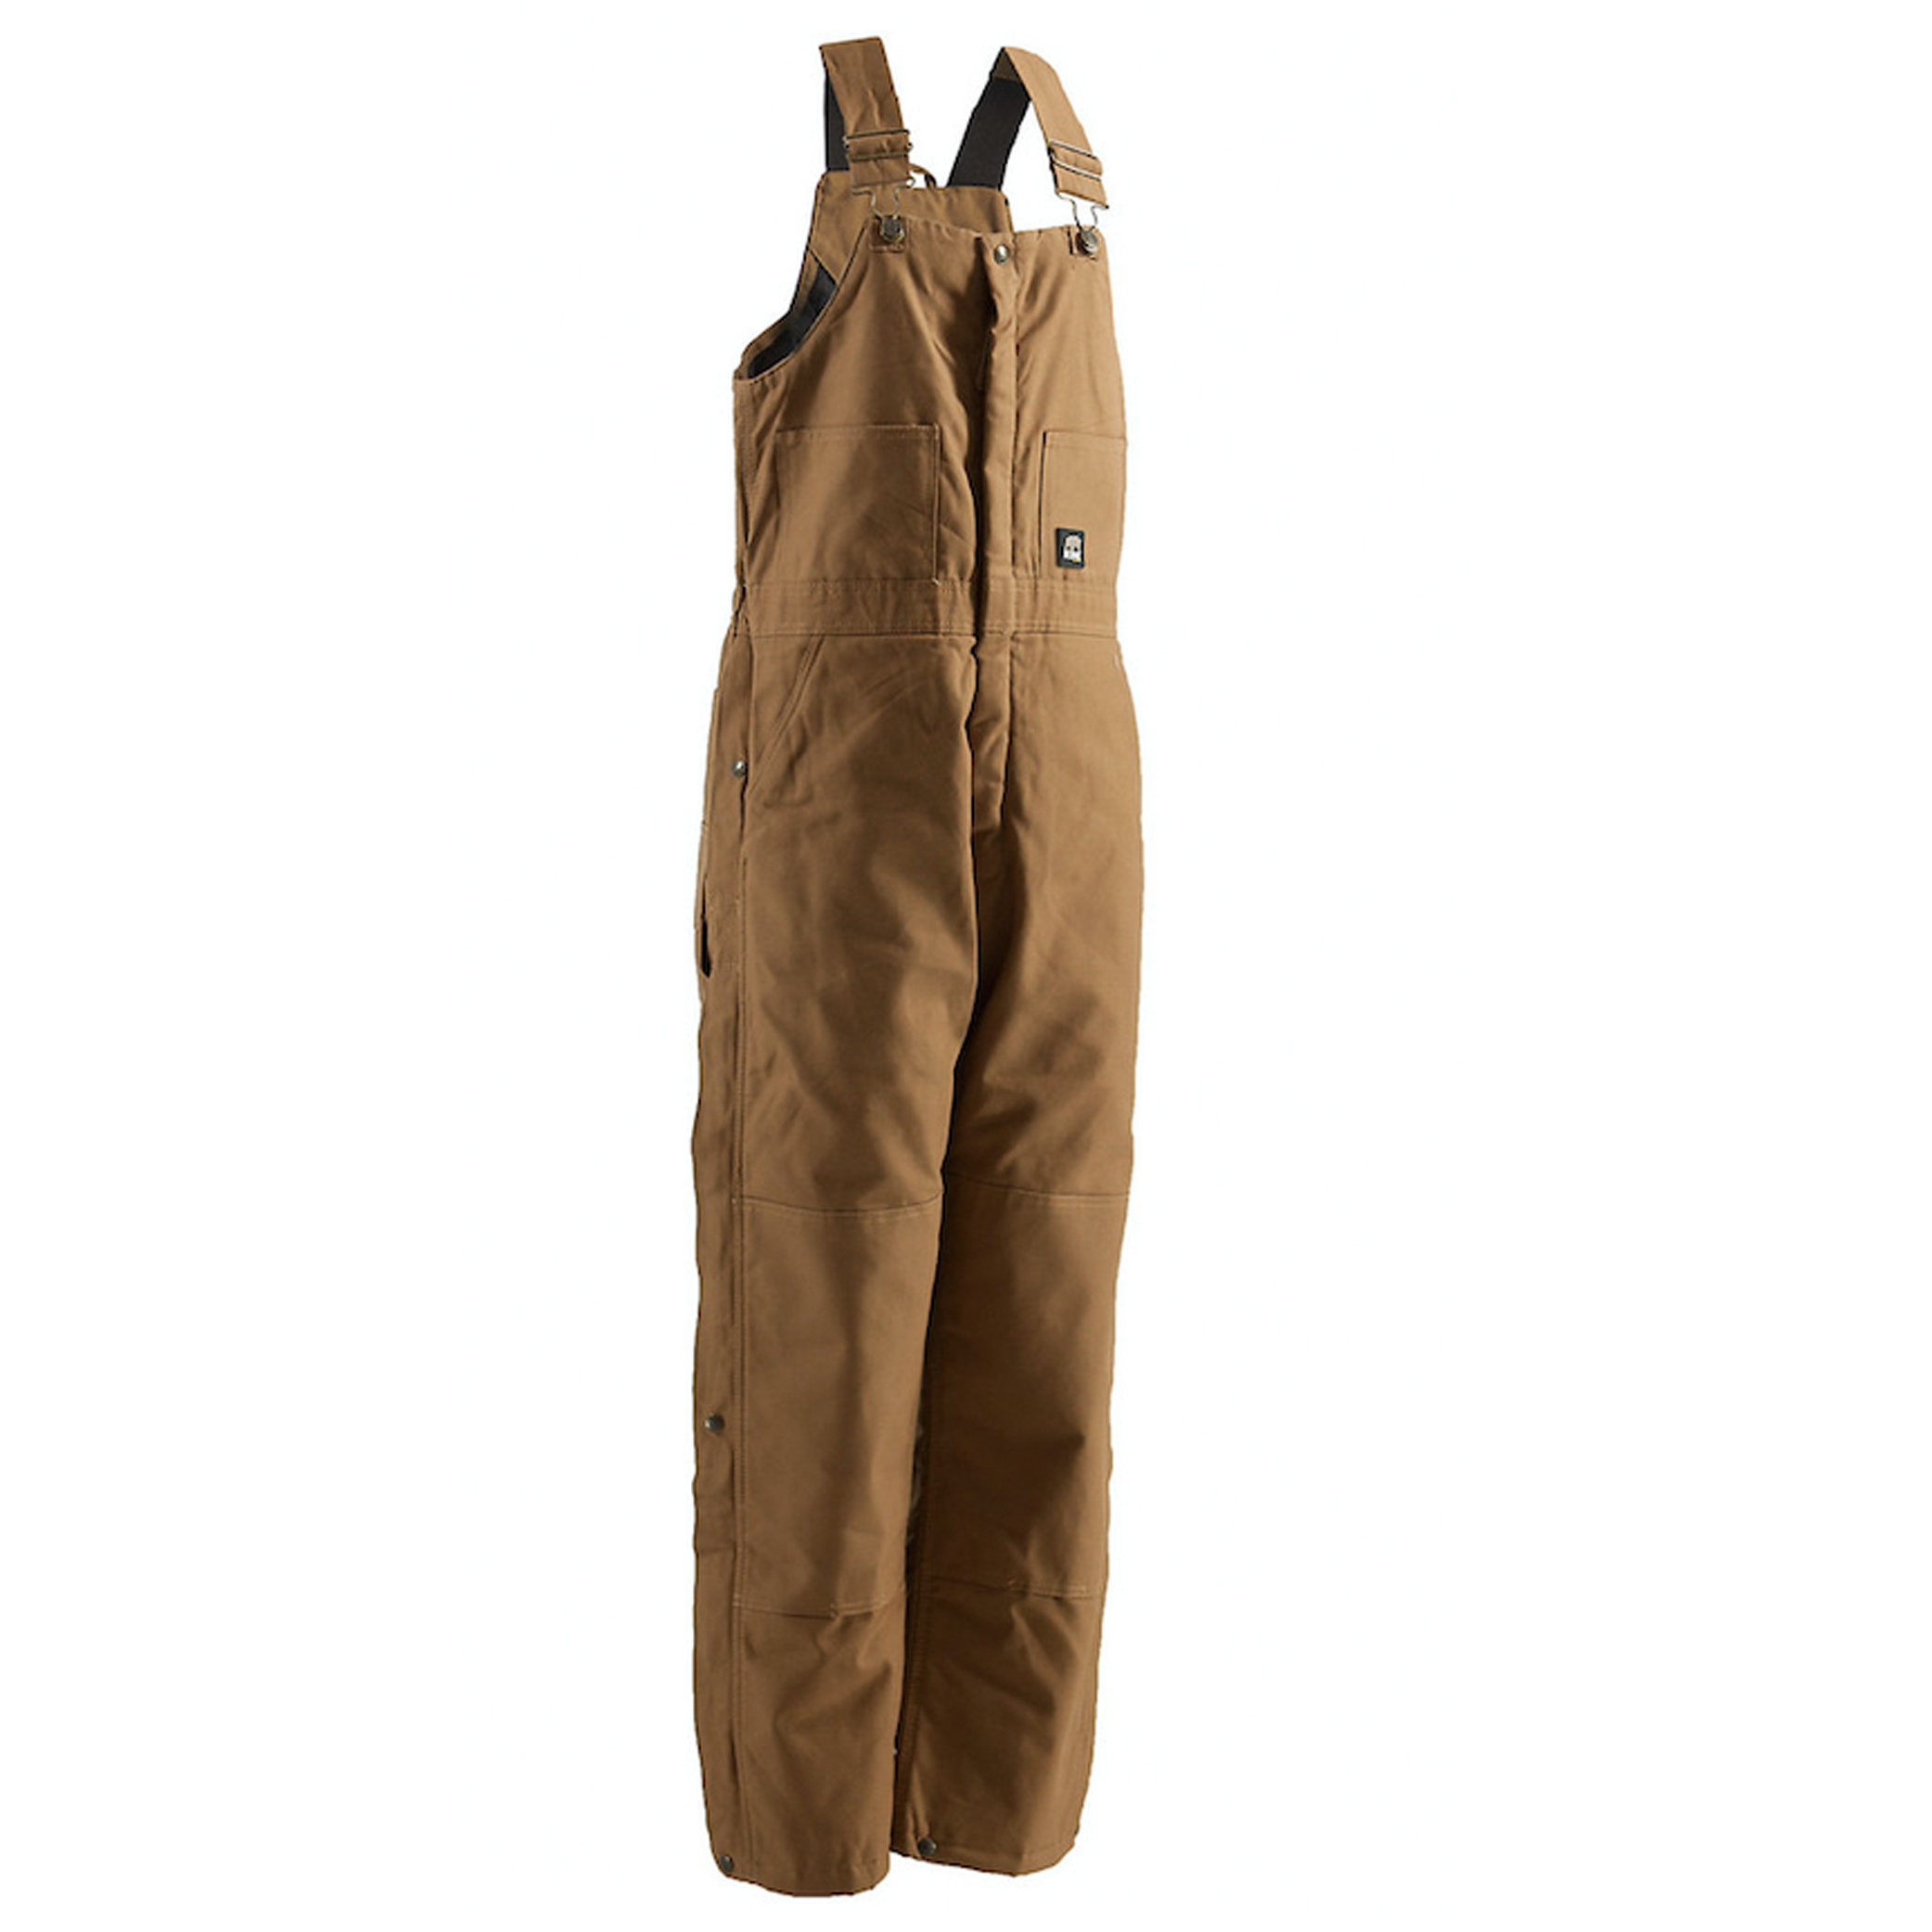 Deluxe Insulated Bib Overall - Short, Dark Brown,Dark Natural, swatch